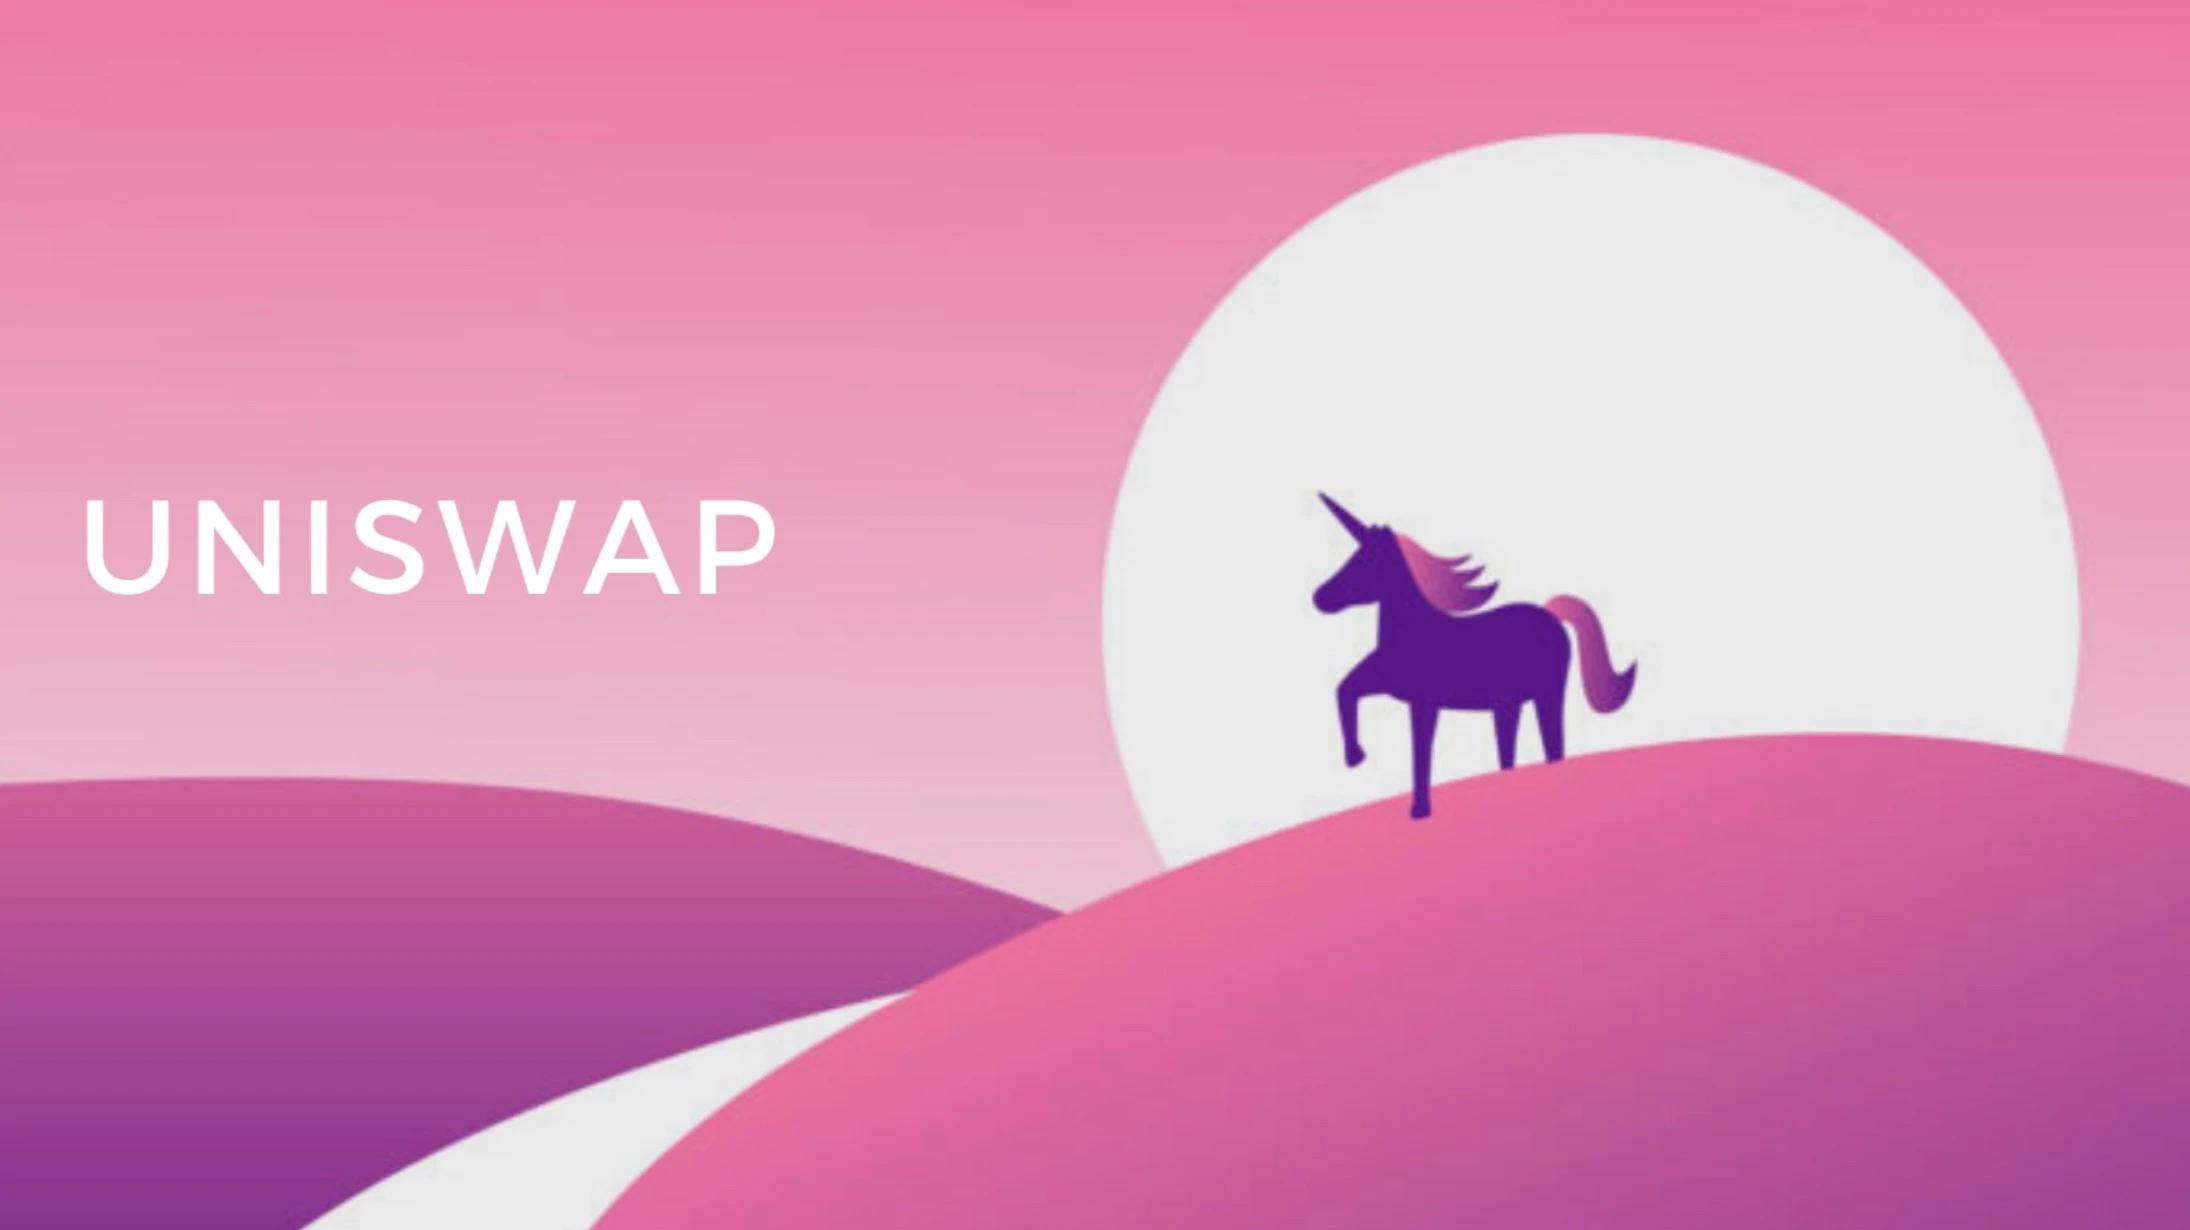 Uniswap9月交易额超过了Coinbase